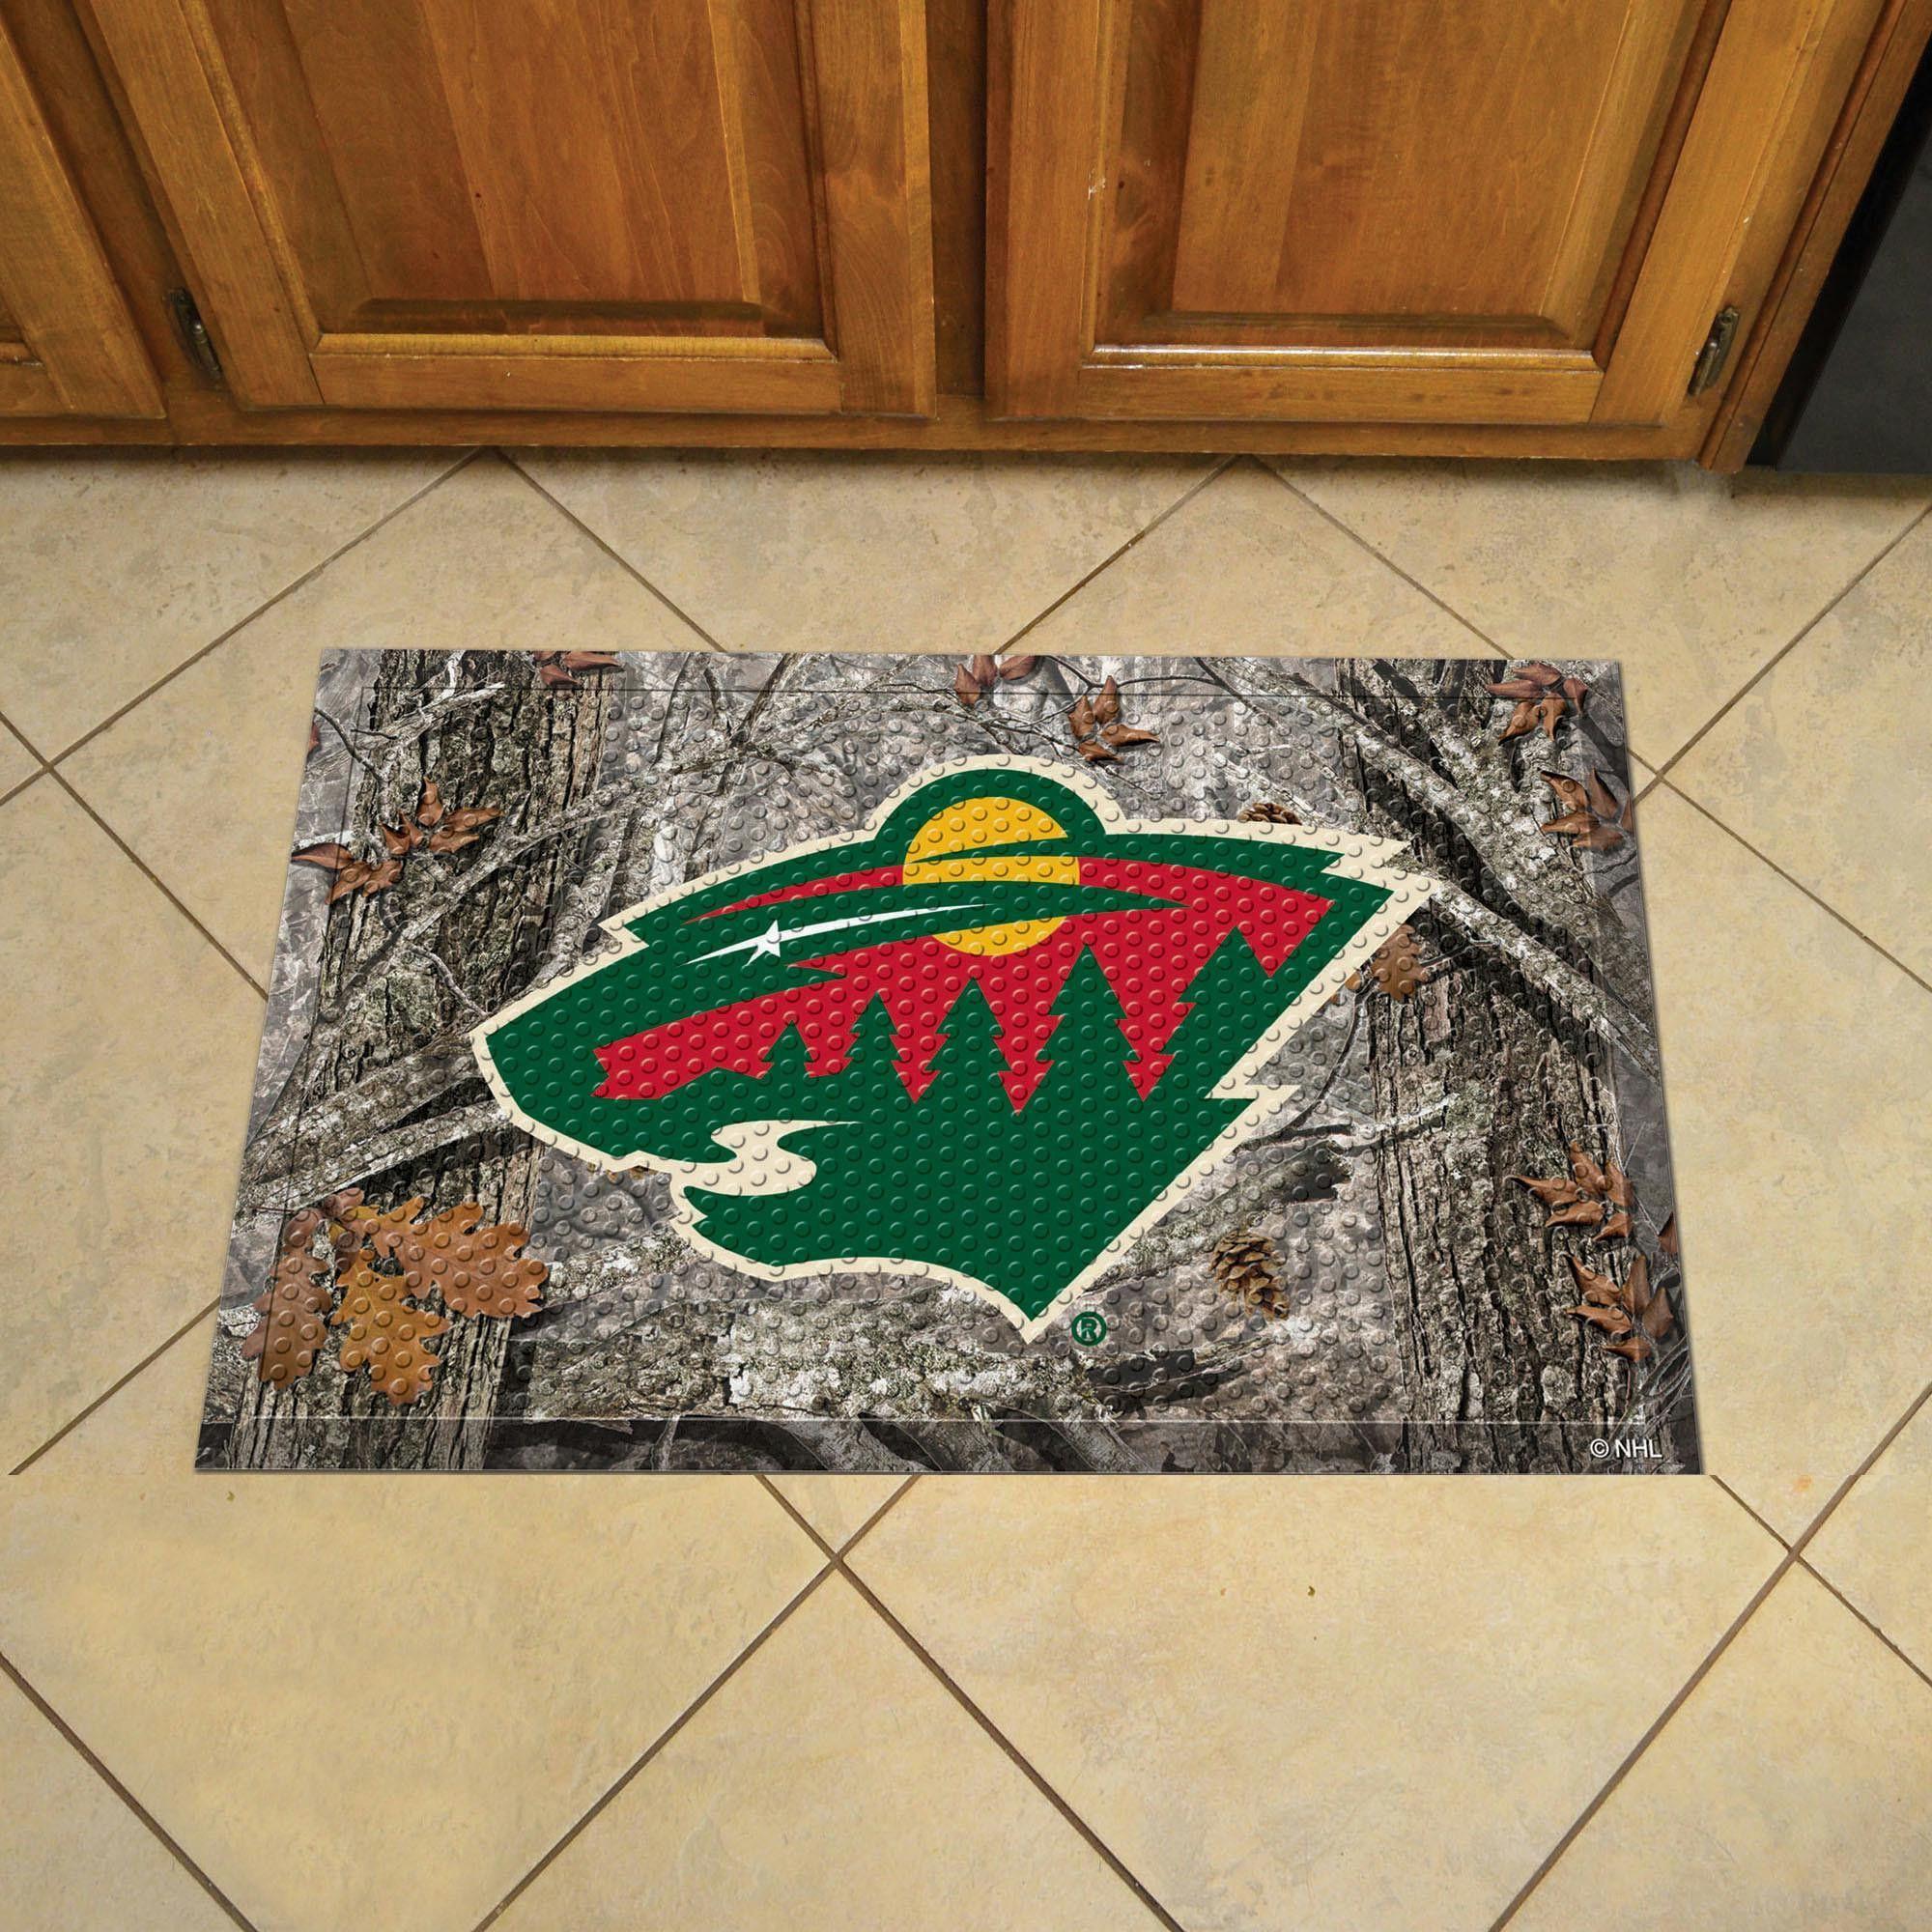 Minnesota Wild Scraper Mat 19x30 - Camo